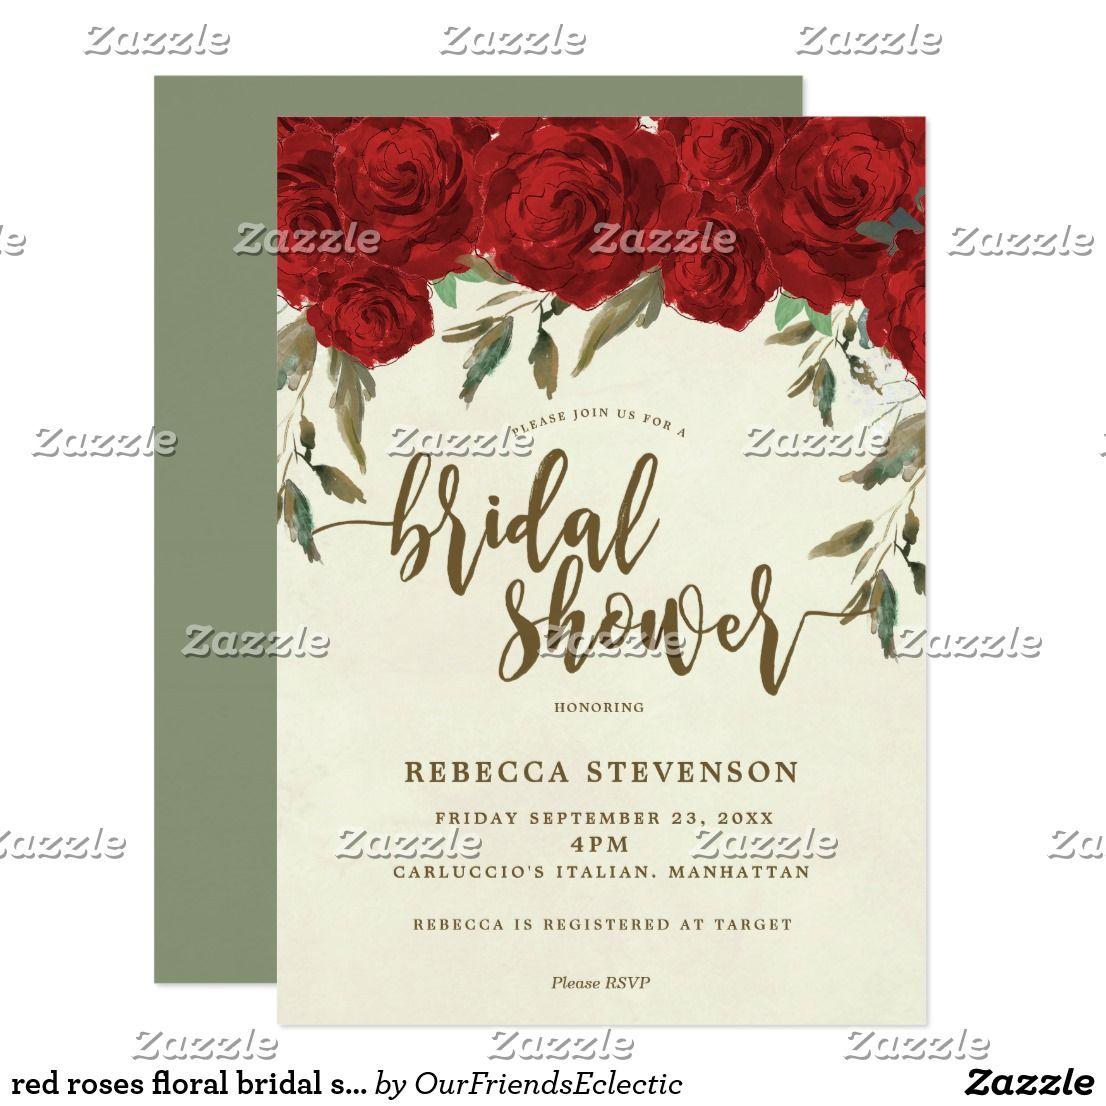 Red roses floral bridal shower invitation | Red roses, Bridal ...